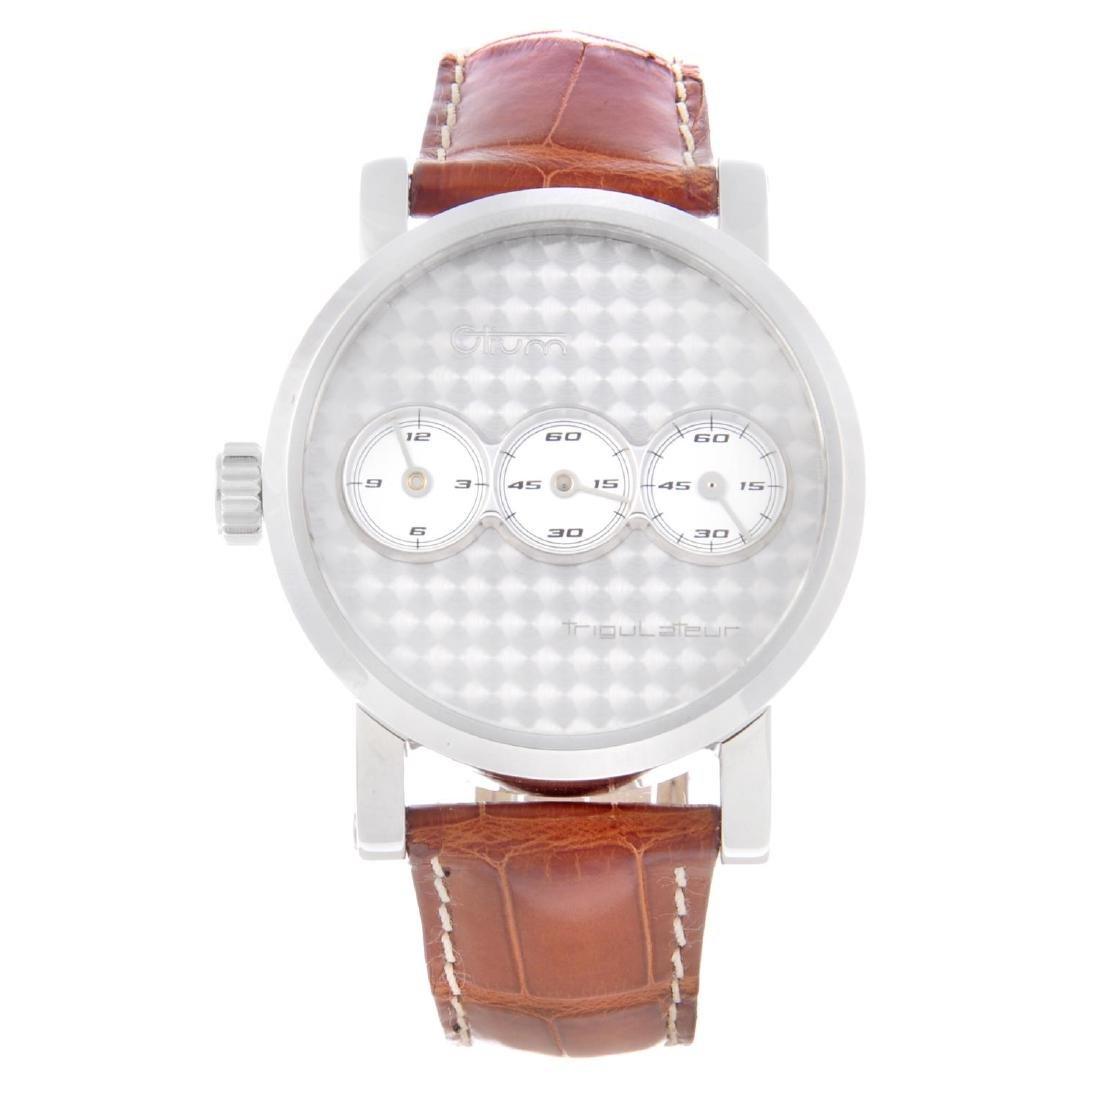 OTIUM - a gentleman's Trigulateur wrist watch.